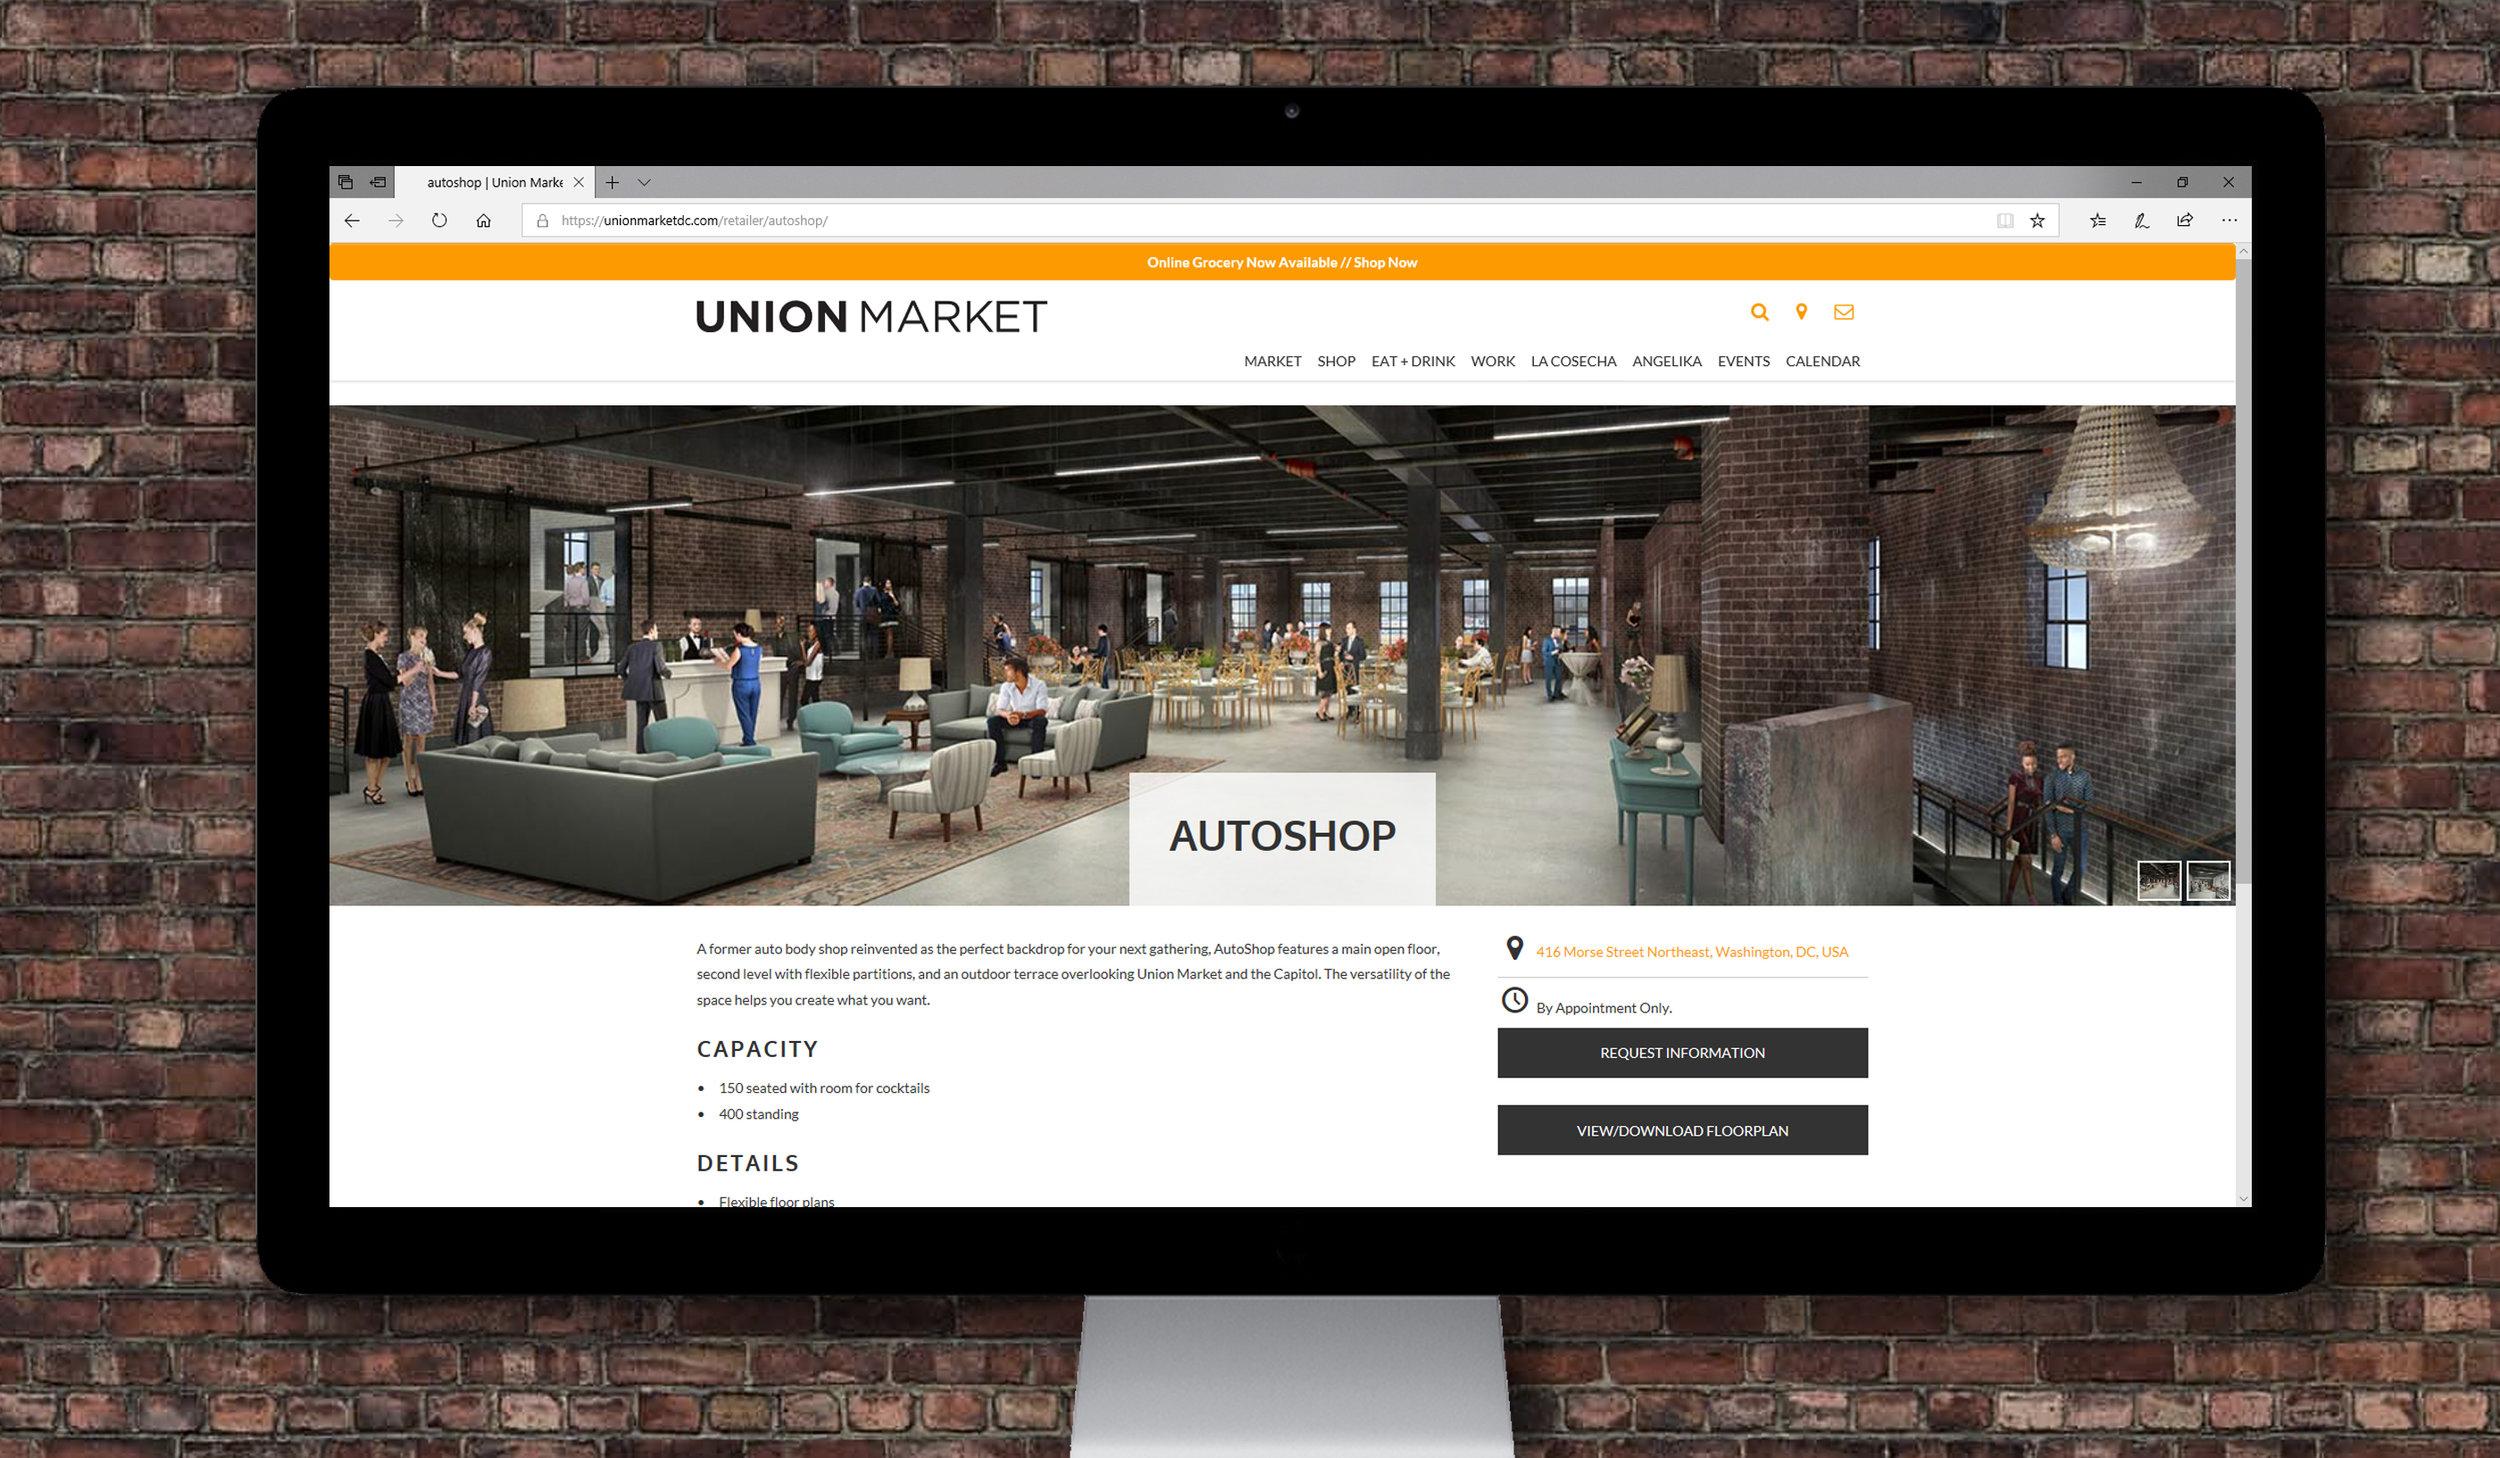 UNION MARKET AUTOSHOP   modeling, stills renderings, marketing   EXPLORE